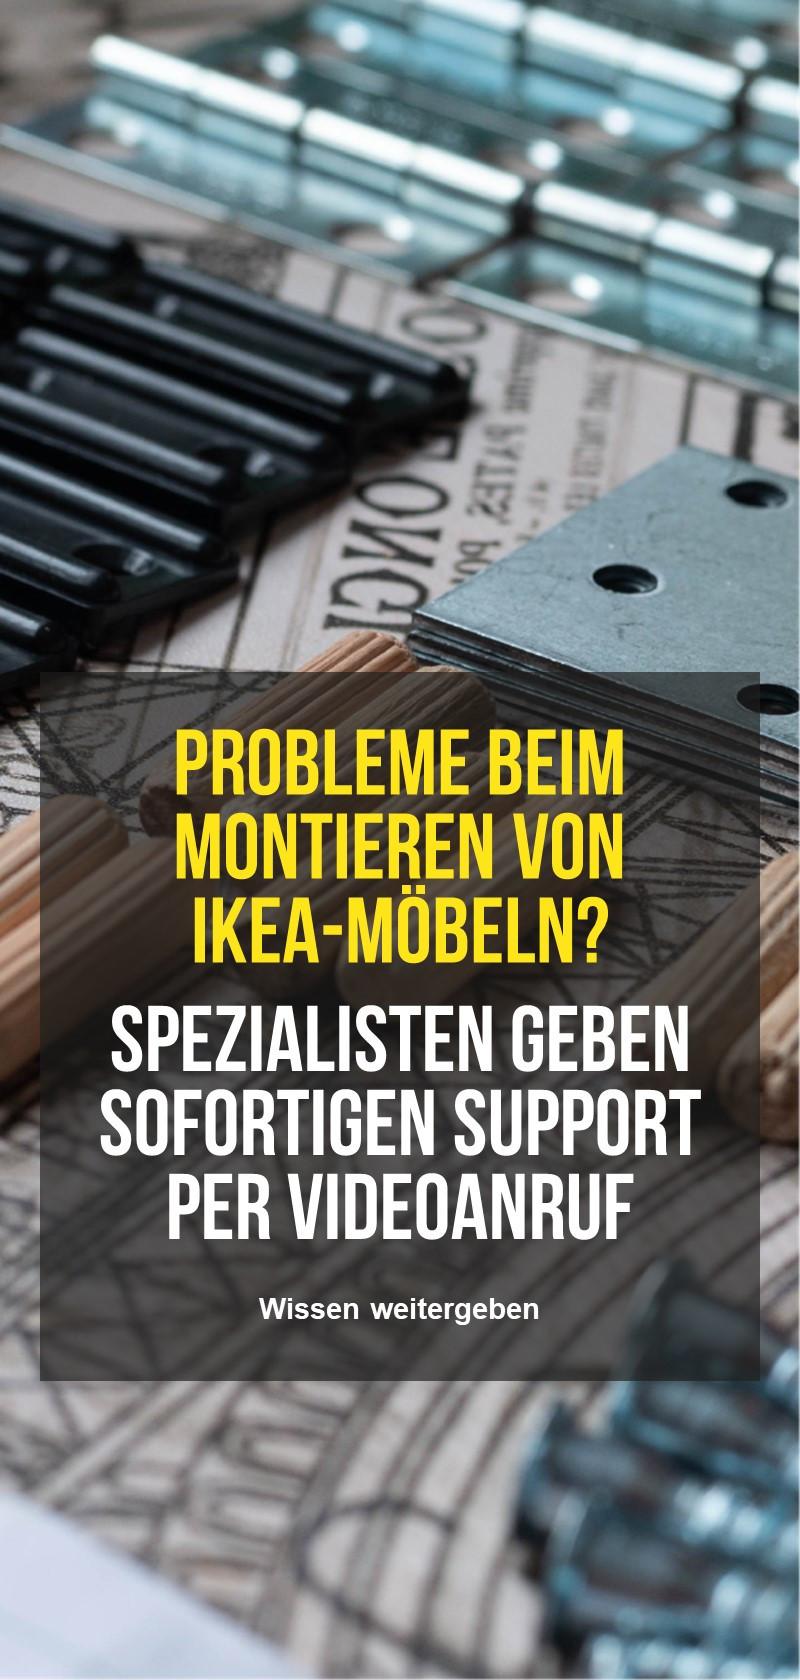 IKEA Möbel-Spezialisten